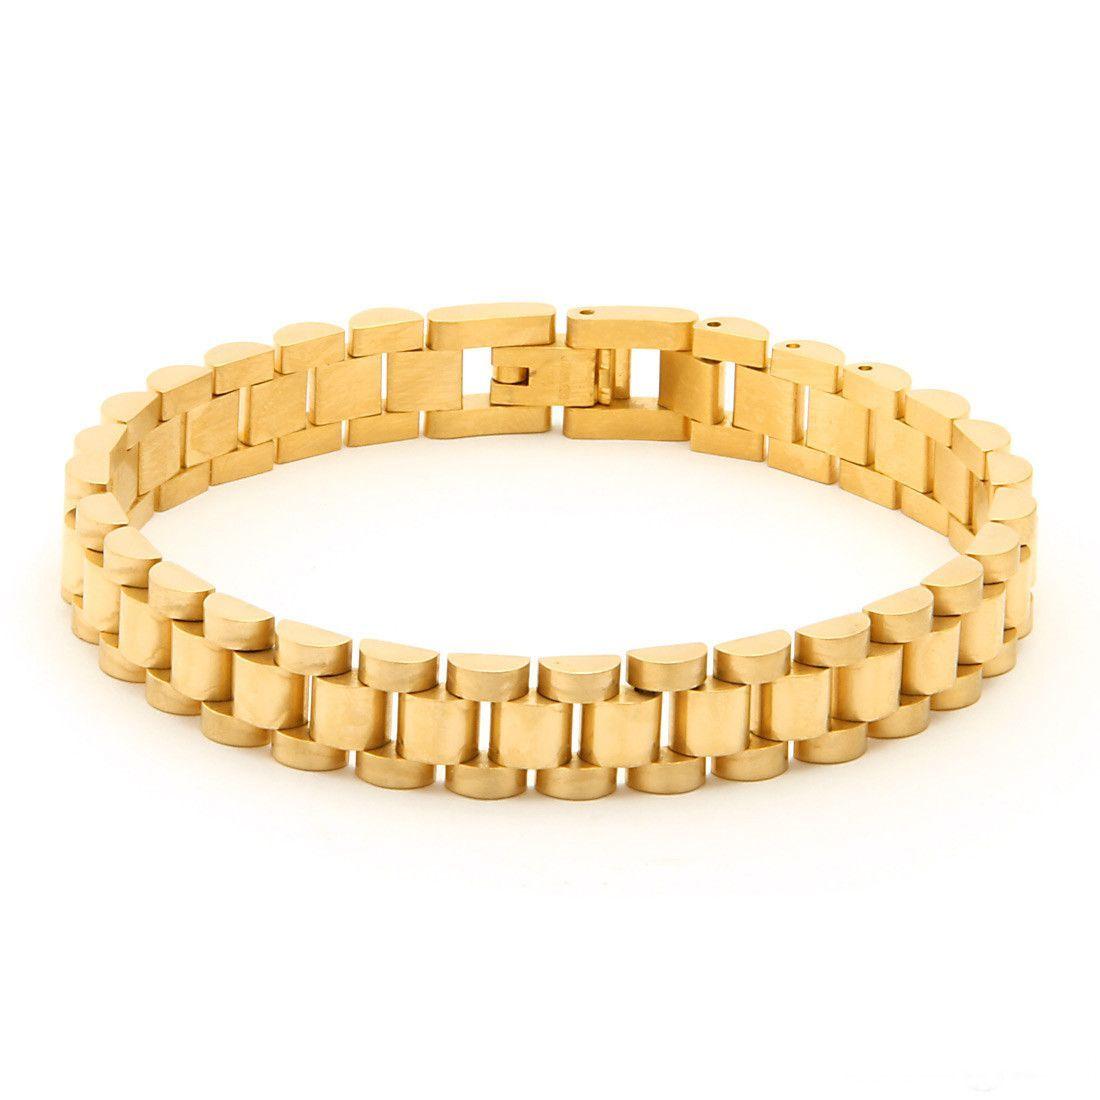 The k gold mm rolex watch link stainless steel bracelet